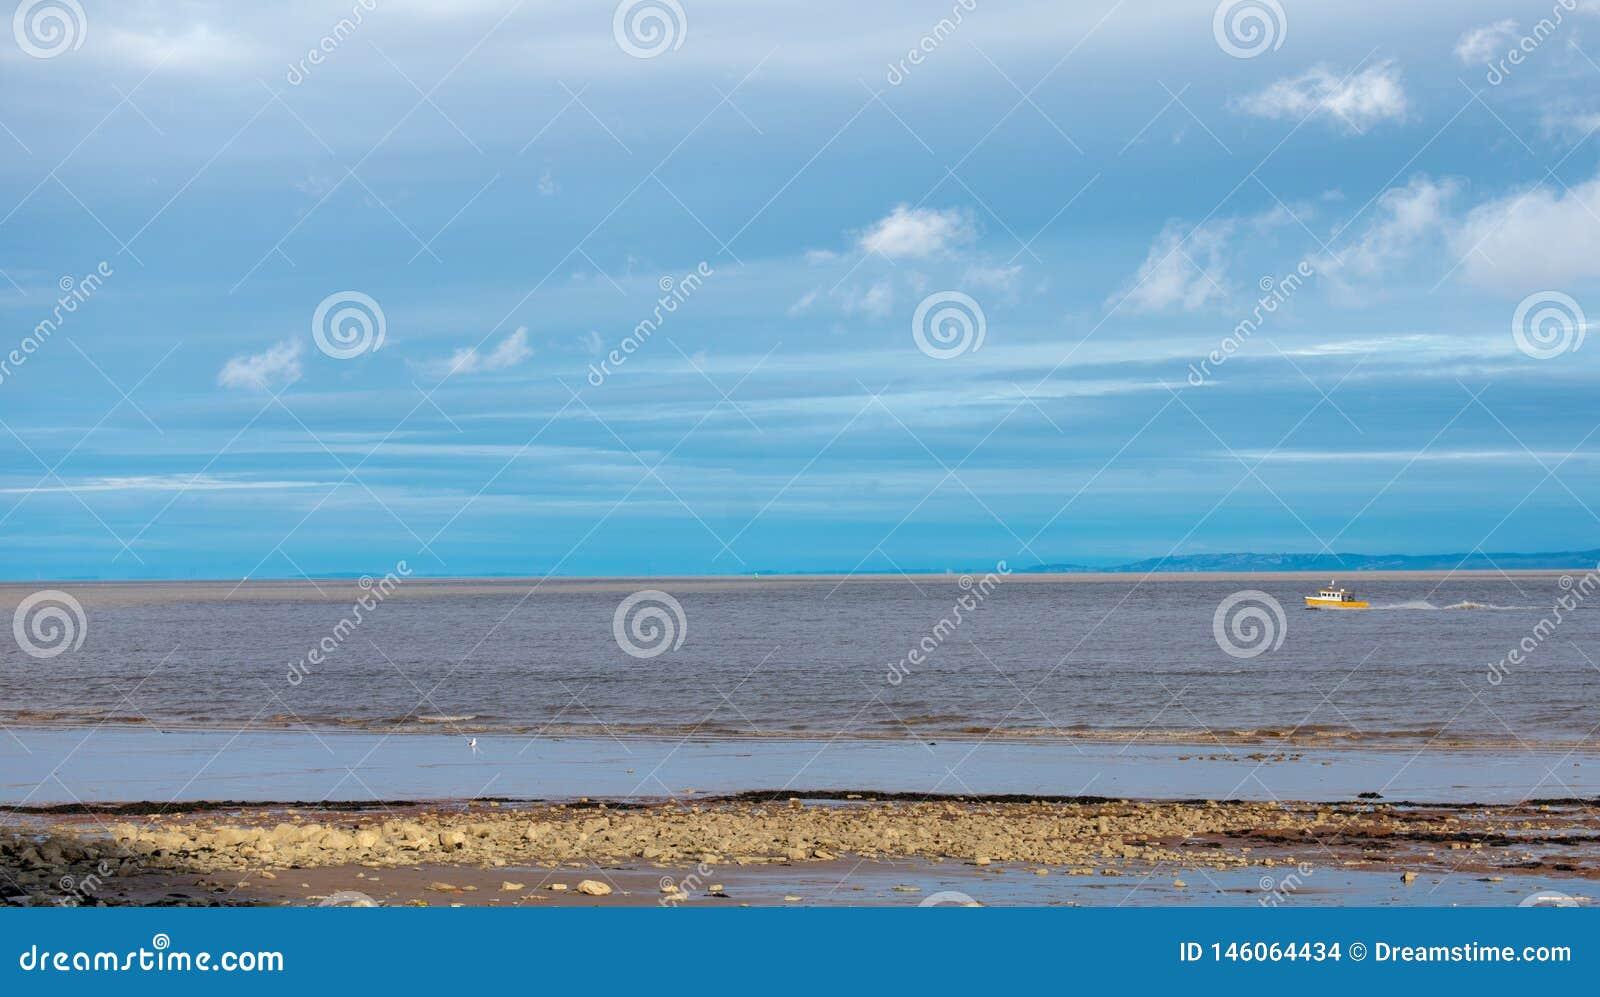 Kalme overzees met kleine boot en blauwe hemel